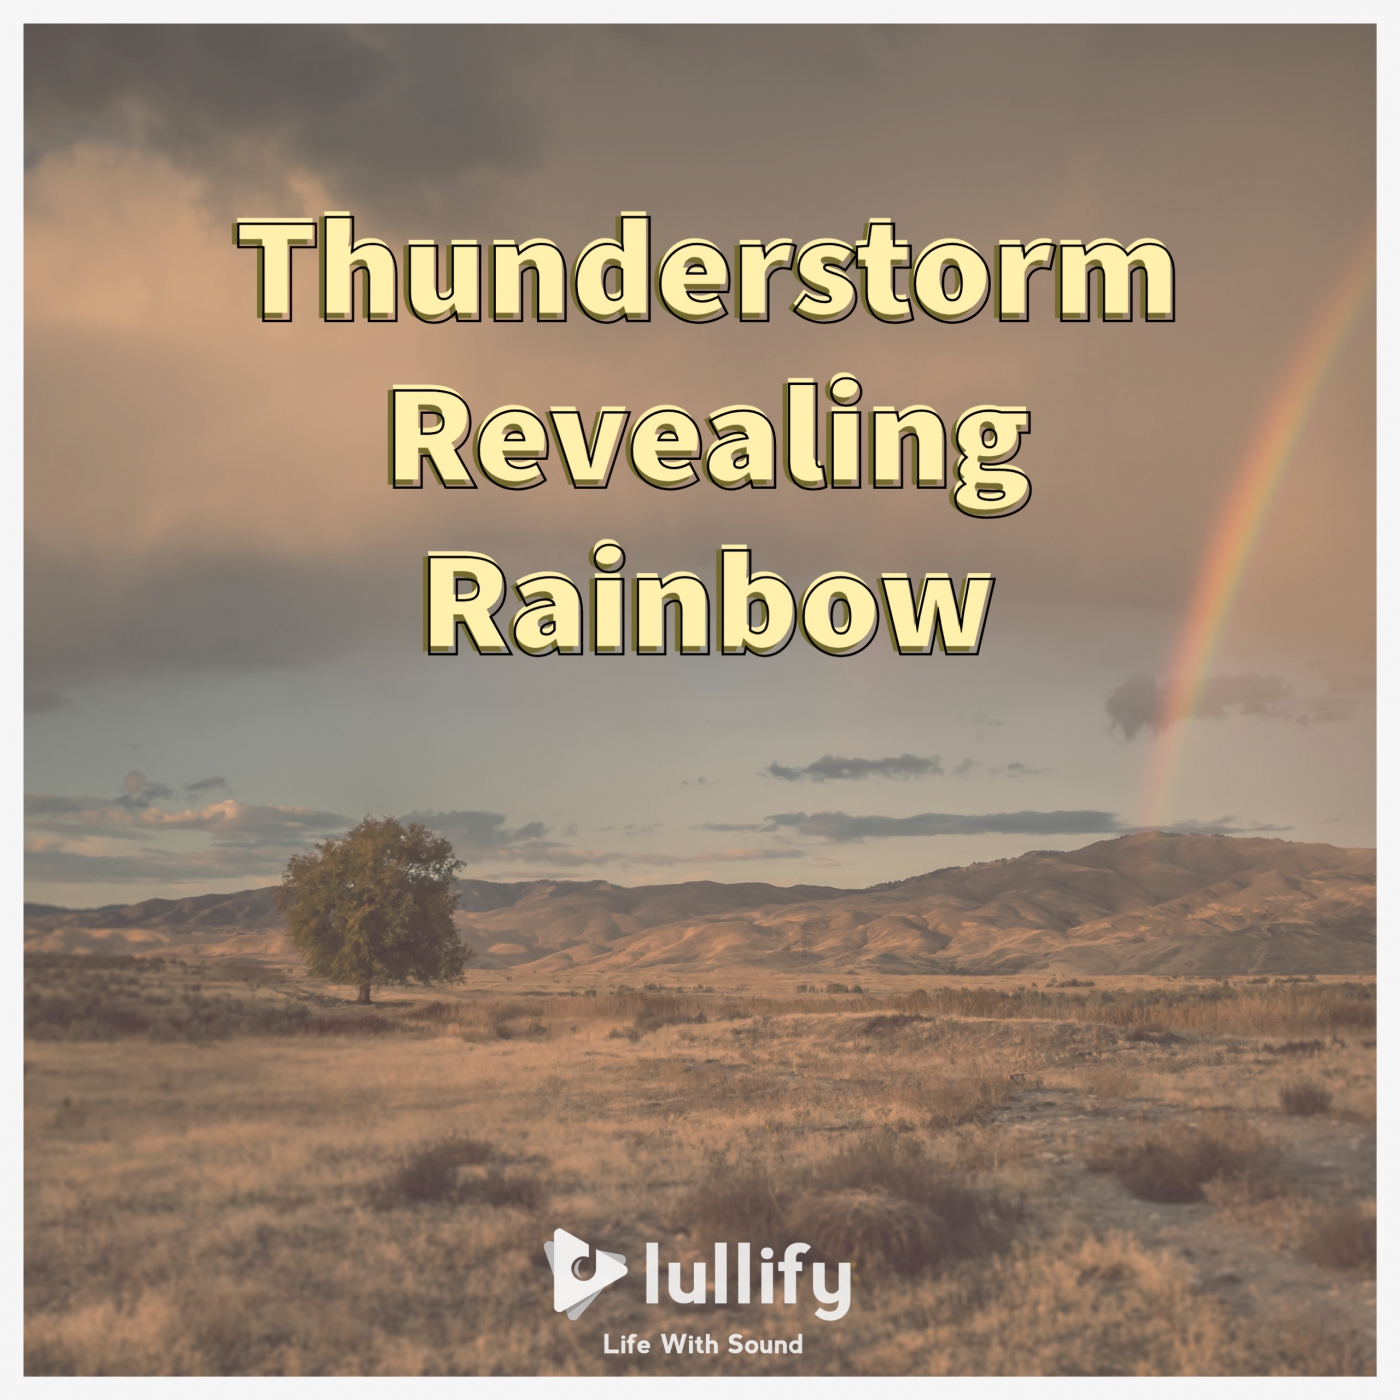 Thunderstorm Revealing Rainbow